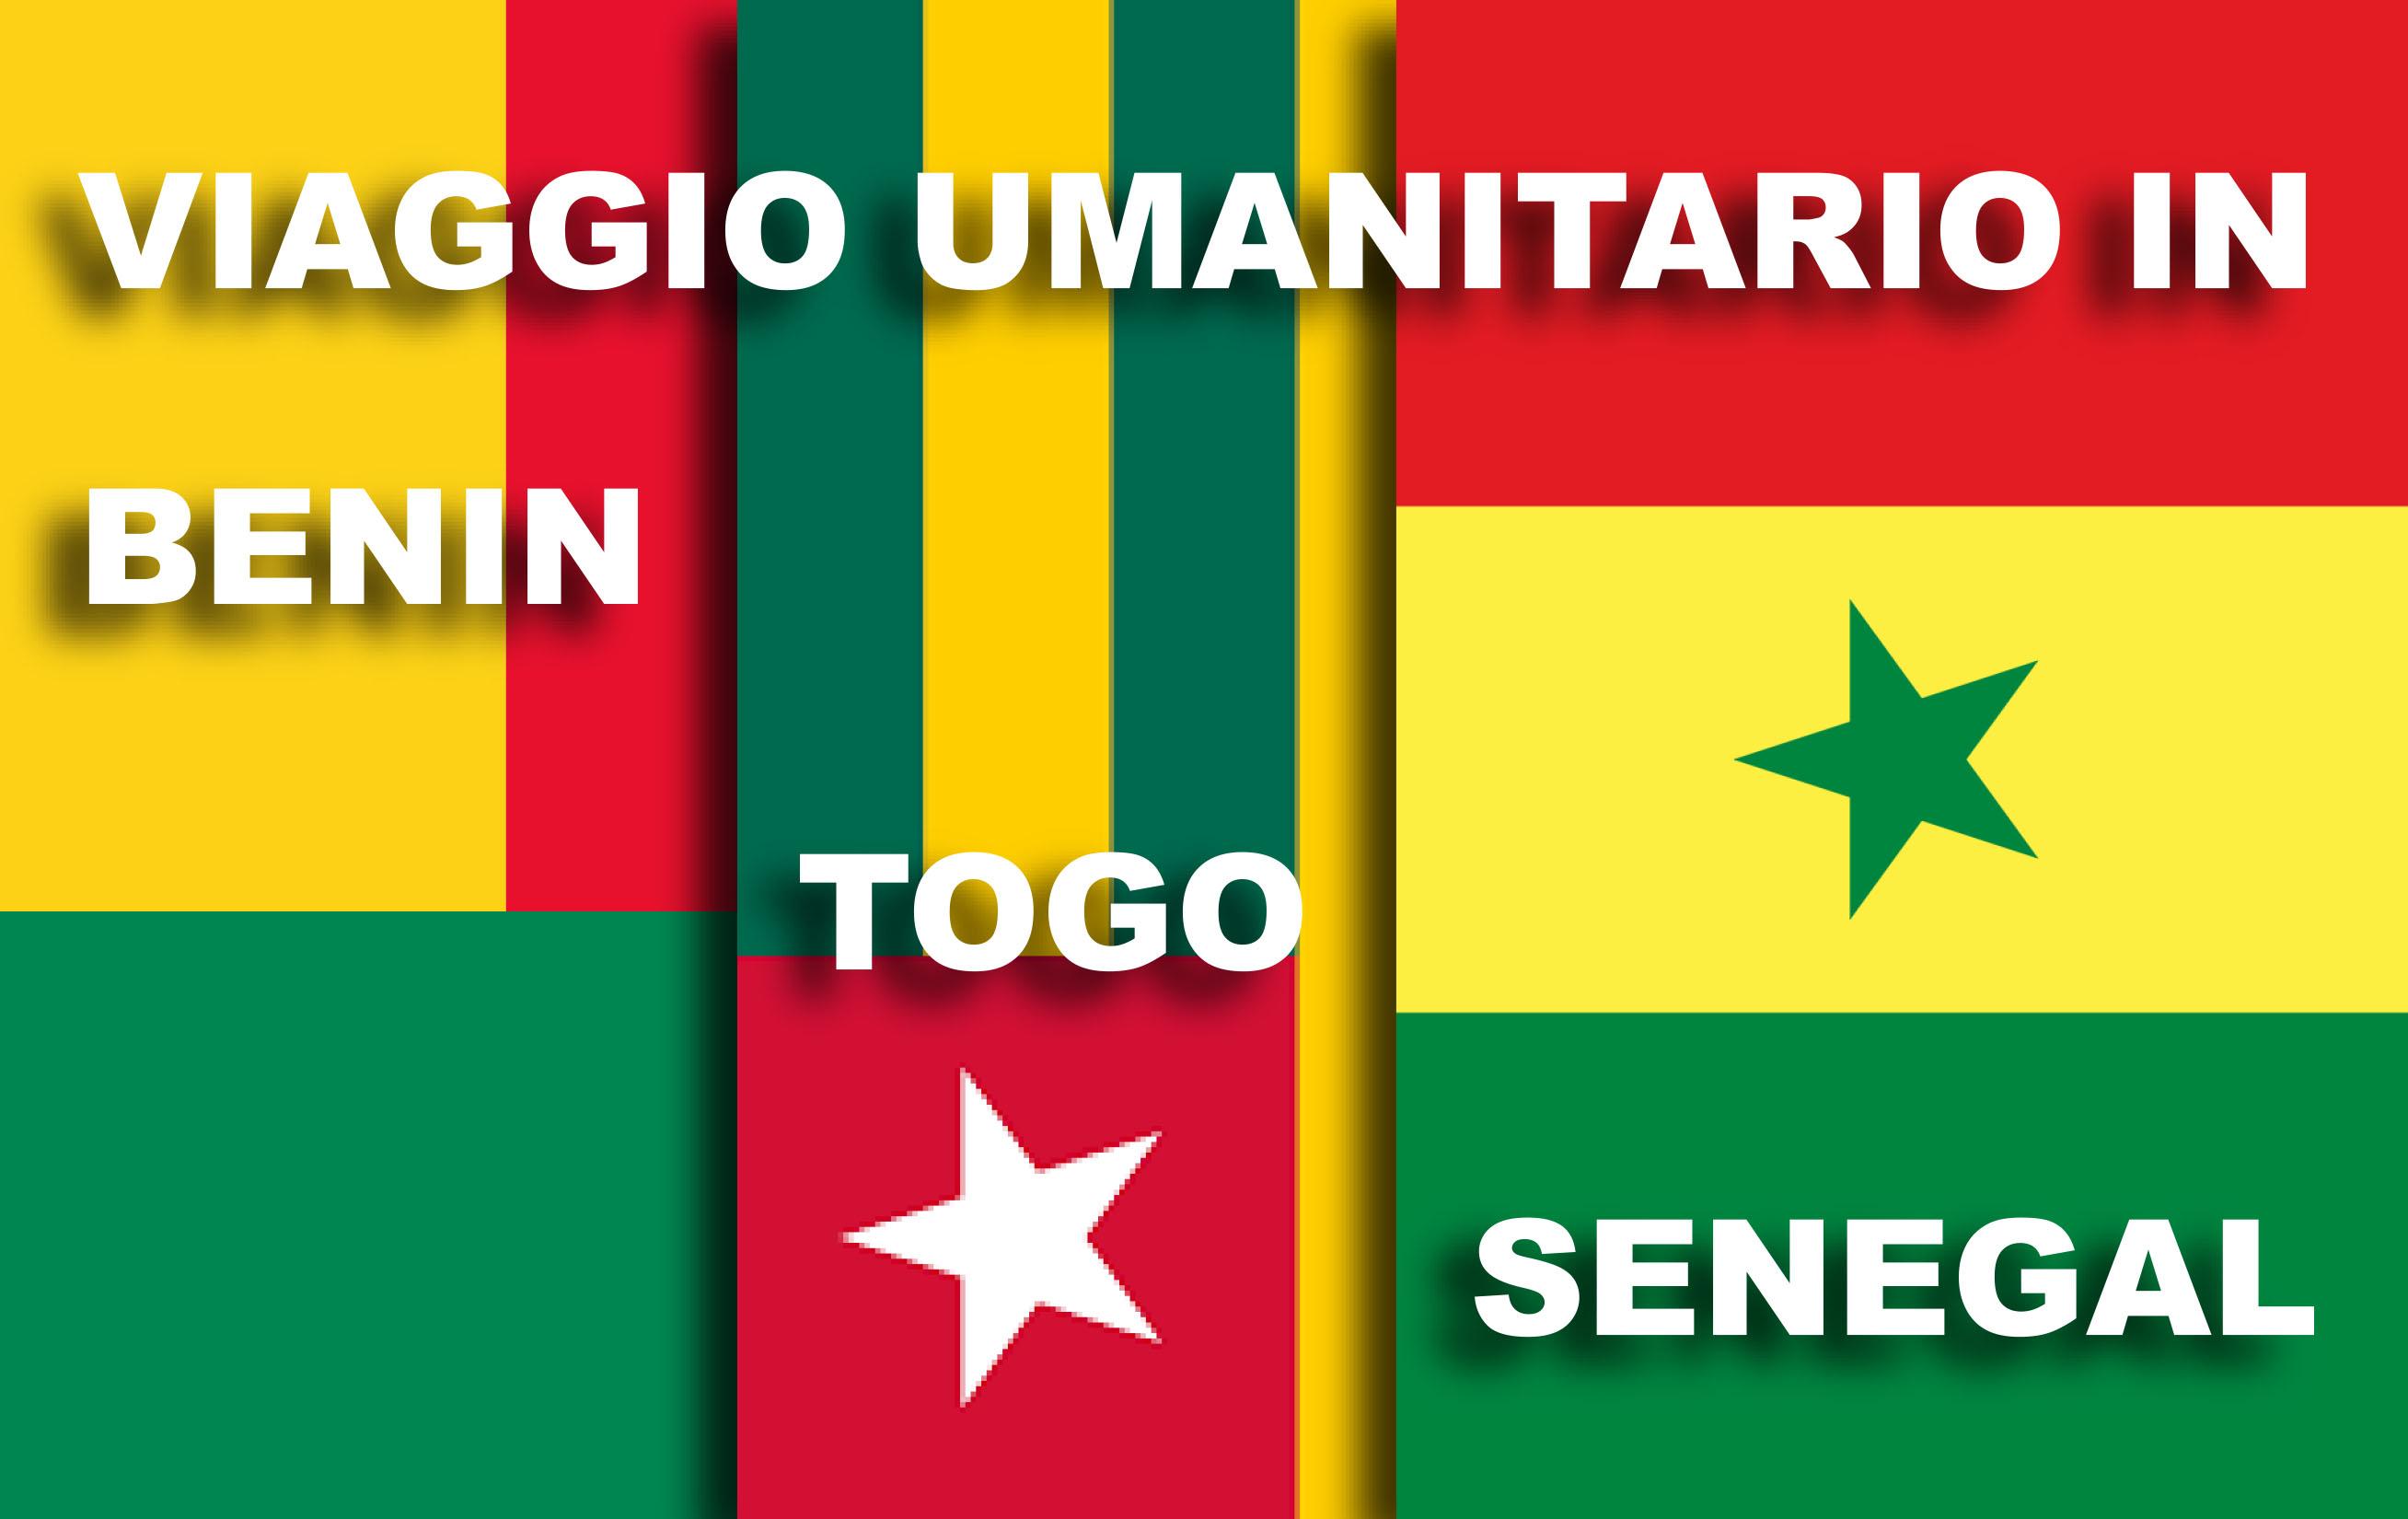 VIAGGIO IN BENIN TOGO SENEGAL